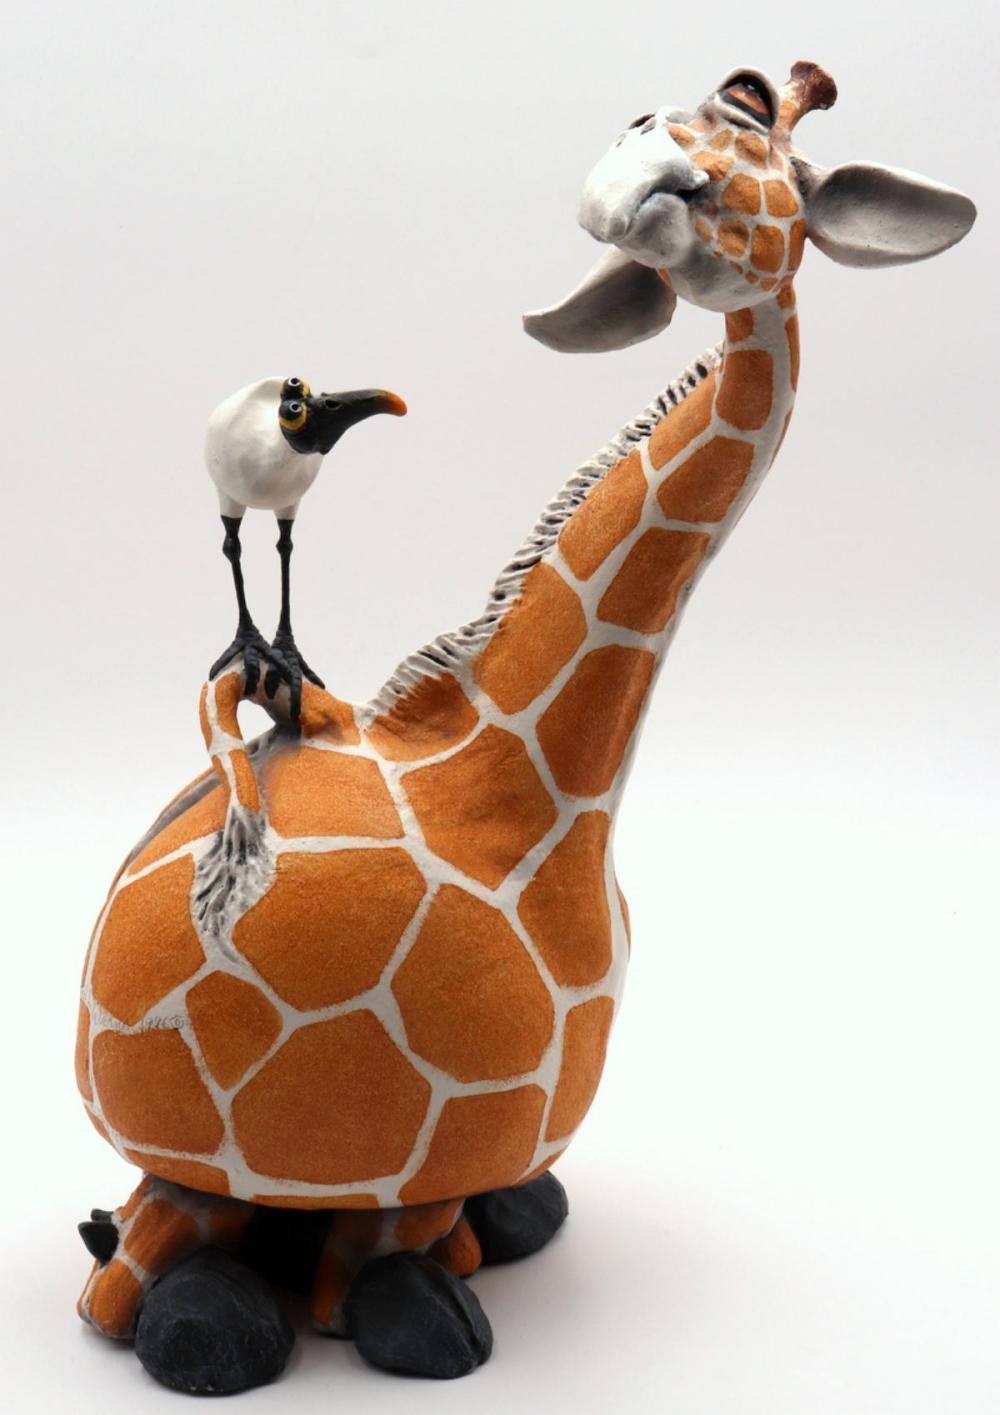 Todd Warner (American, b. 1945) Giraffe Sculpture